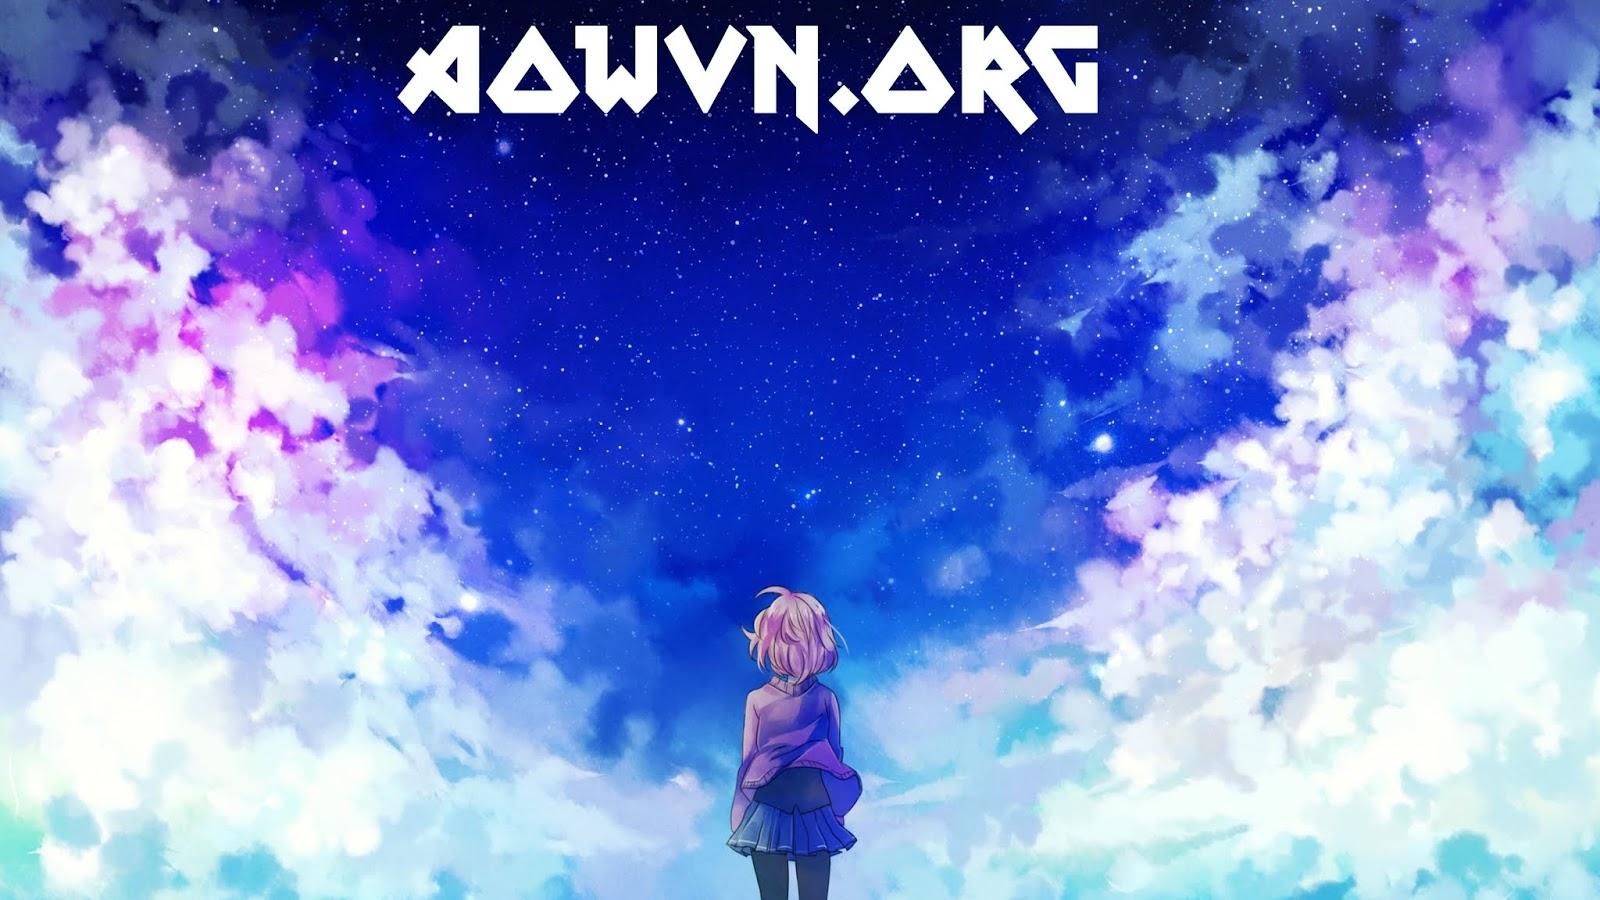 kuriyama mirai back view kyoukai no kanata stars clouds - [ Anime 3gp Mp4 ] Kyoukai no Kanata BD + Movie + Spin Off  + Special | Vietsub - Cực hay!!